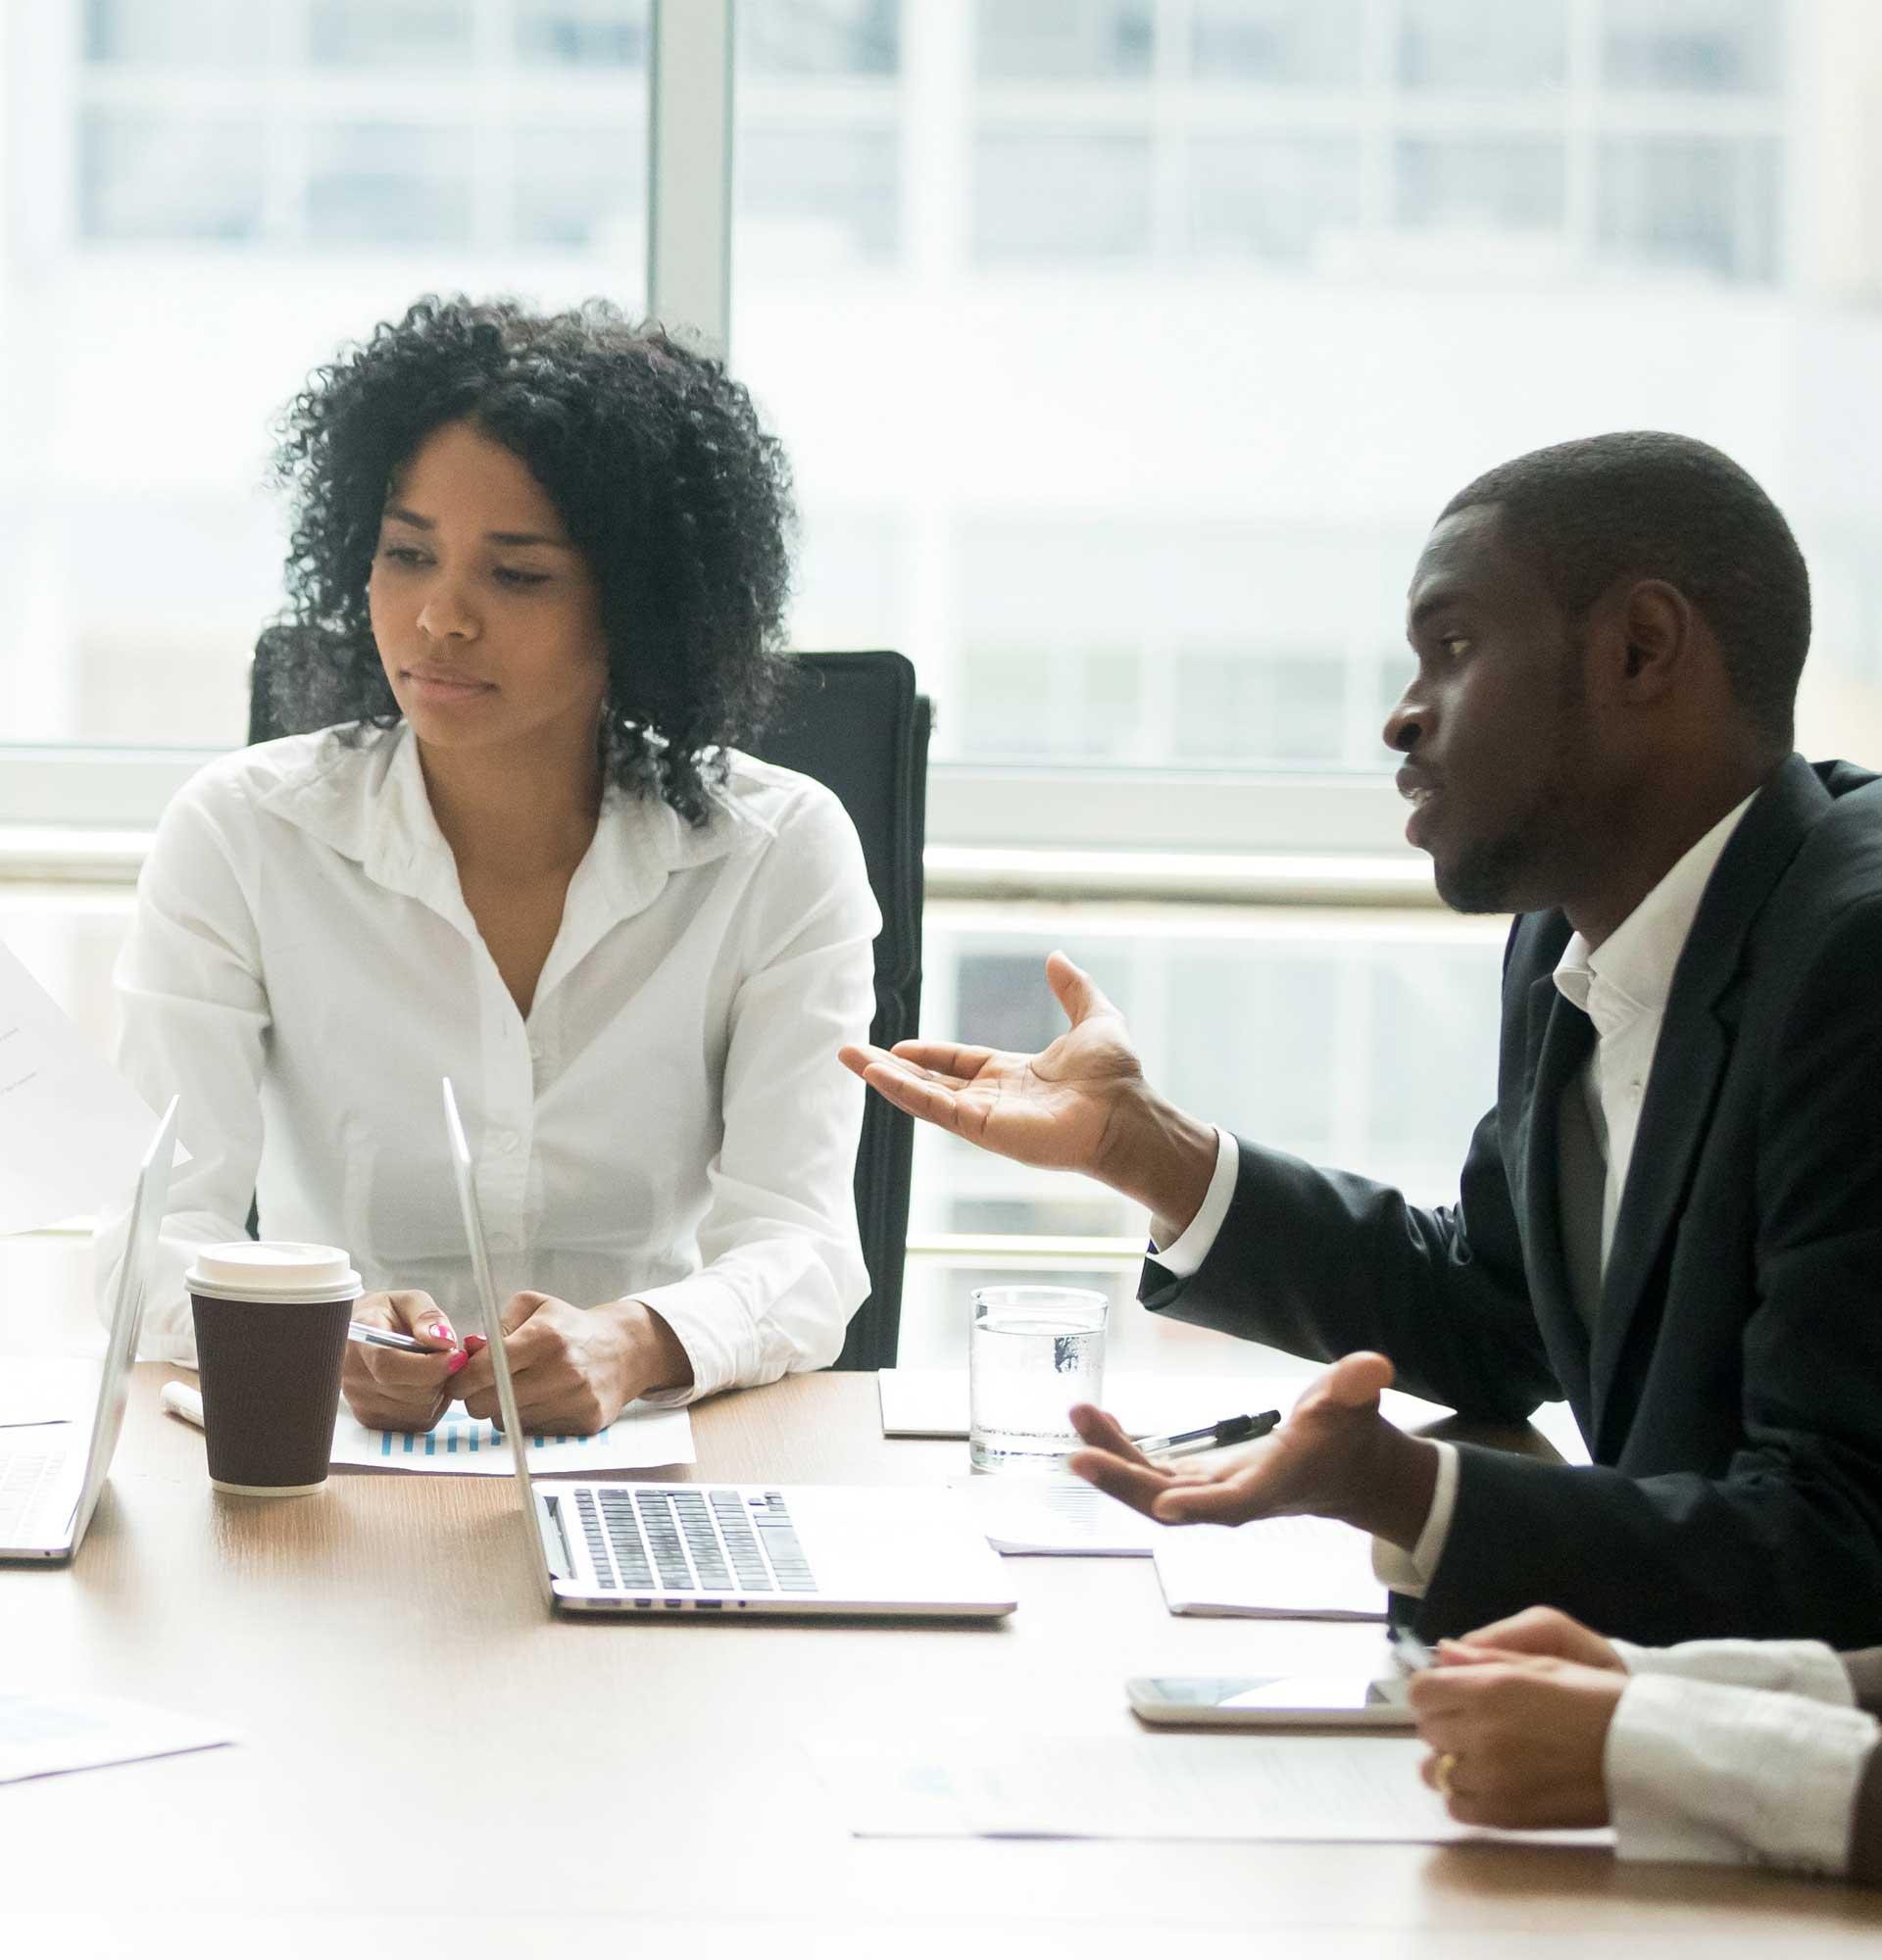 Lean on TriNet's HR expertise